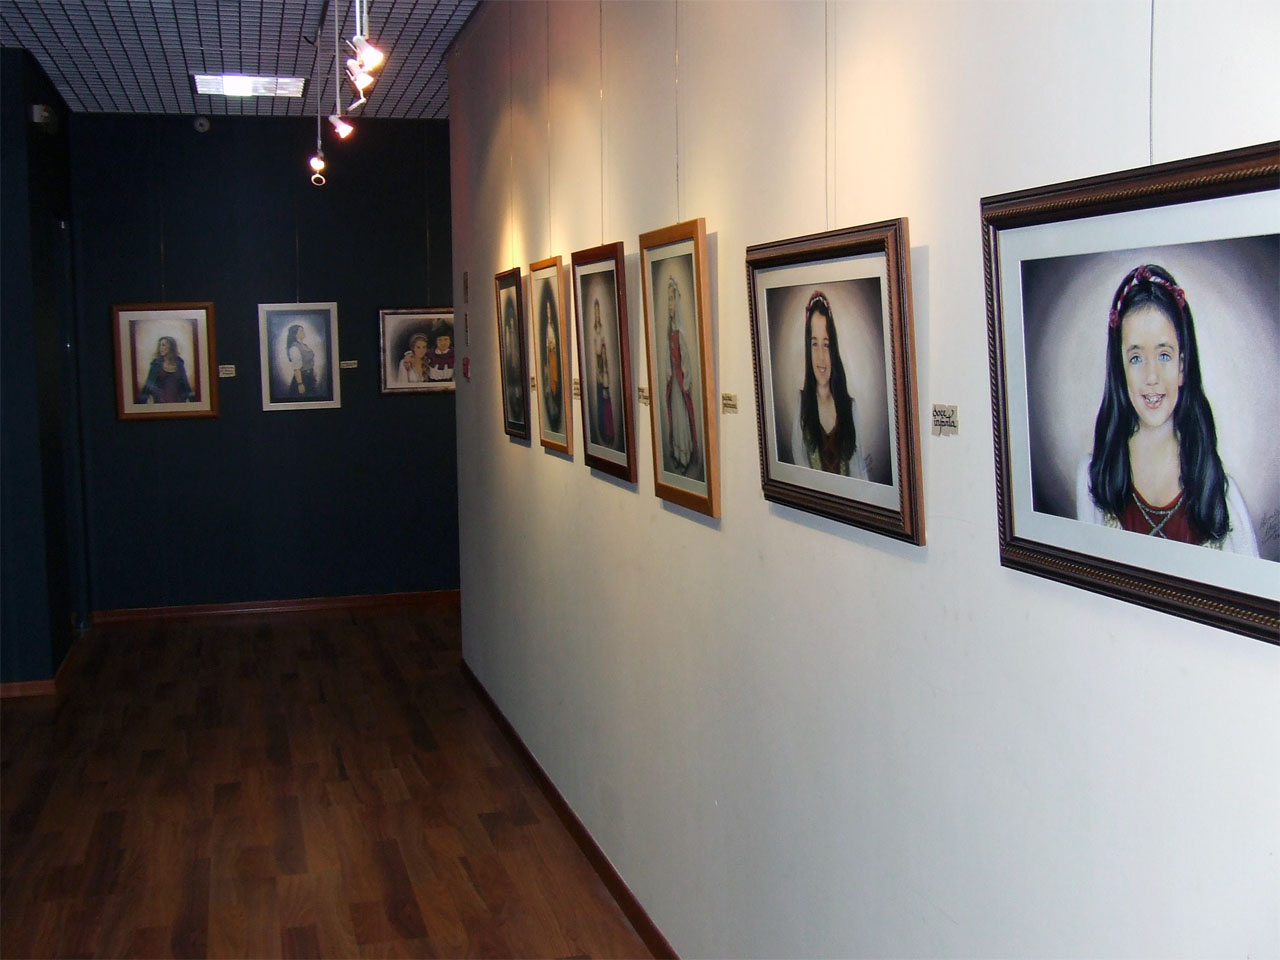 sala de exposições_0006_DSCF4384.JPG